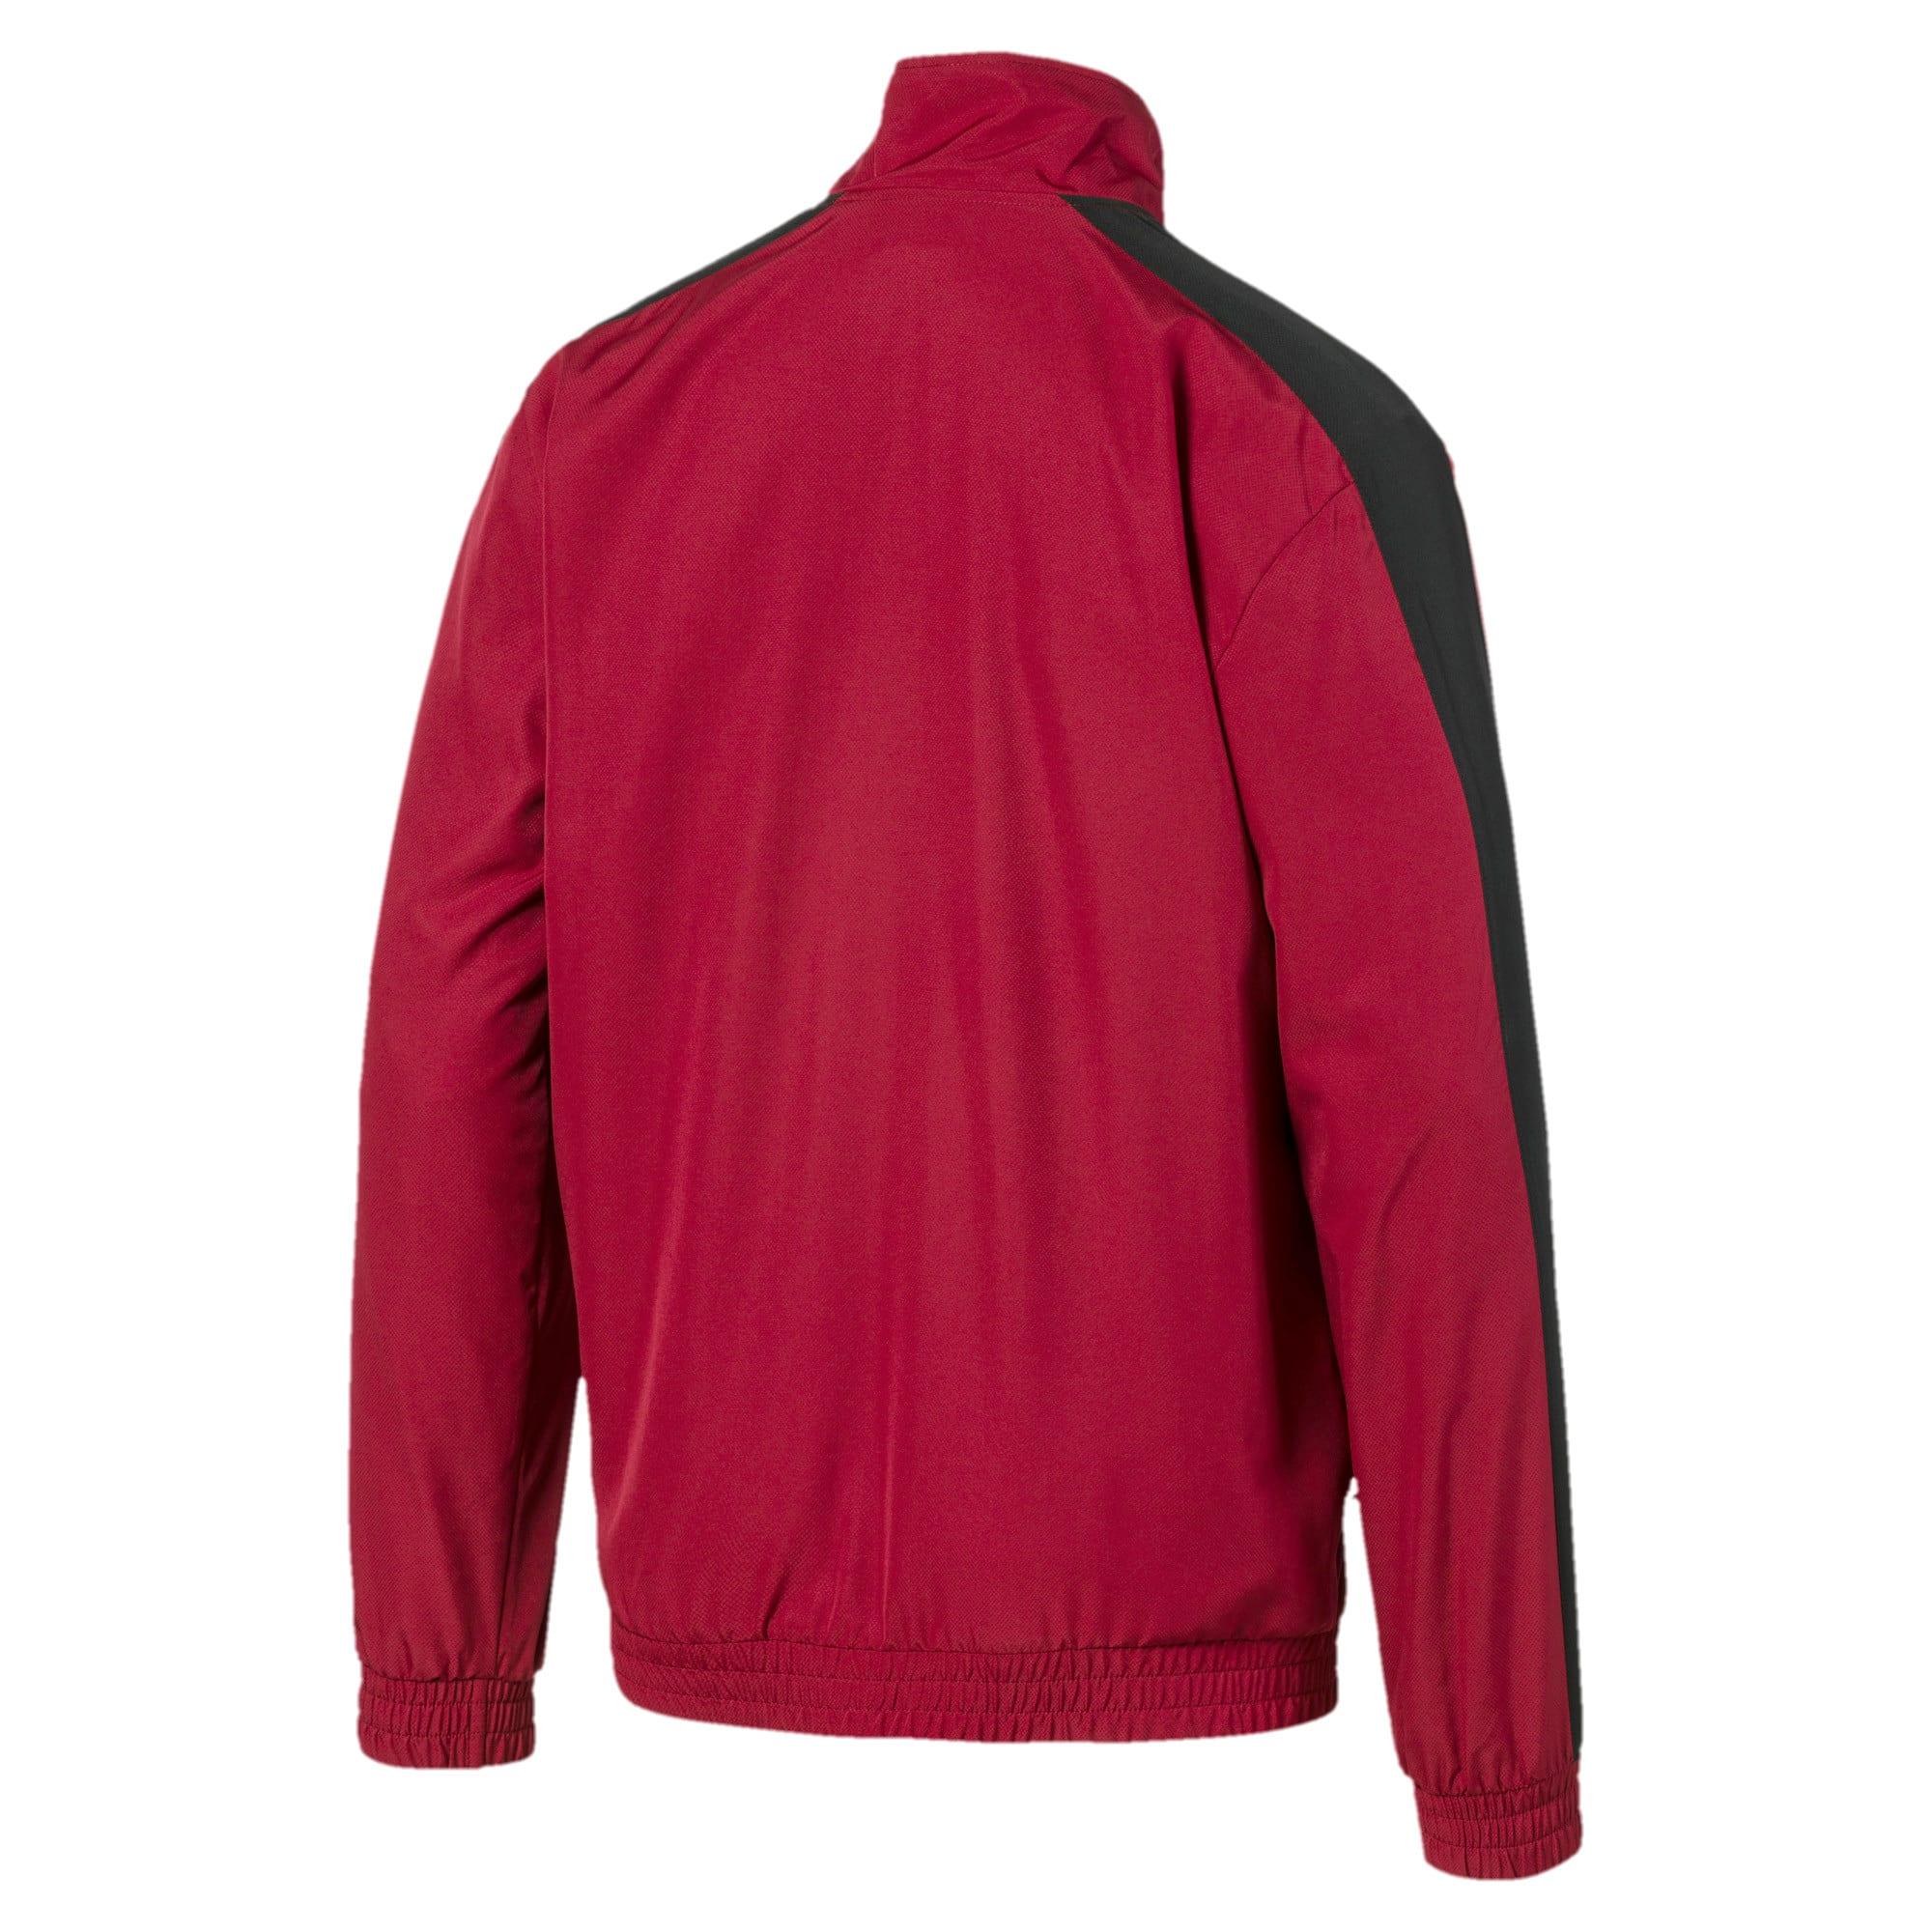 Thumbnail 5 of Iconic T7 Men's Woven Track Jacket, Rhubarb, medium